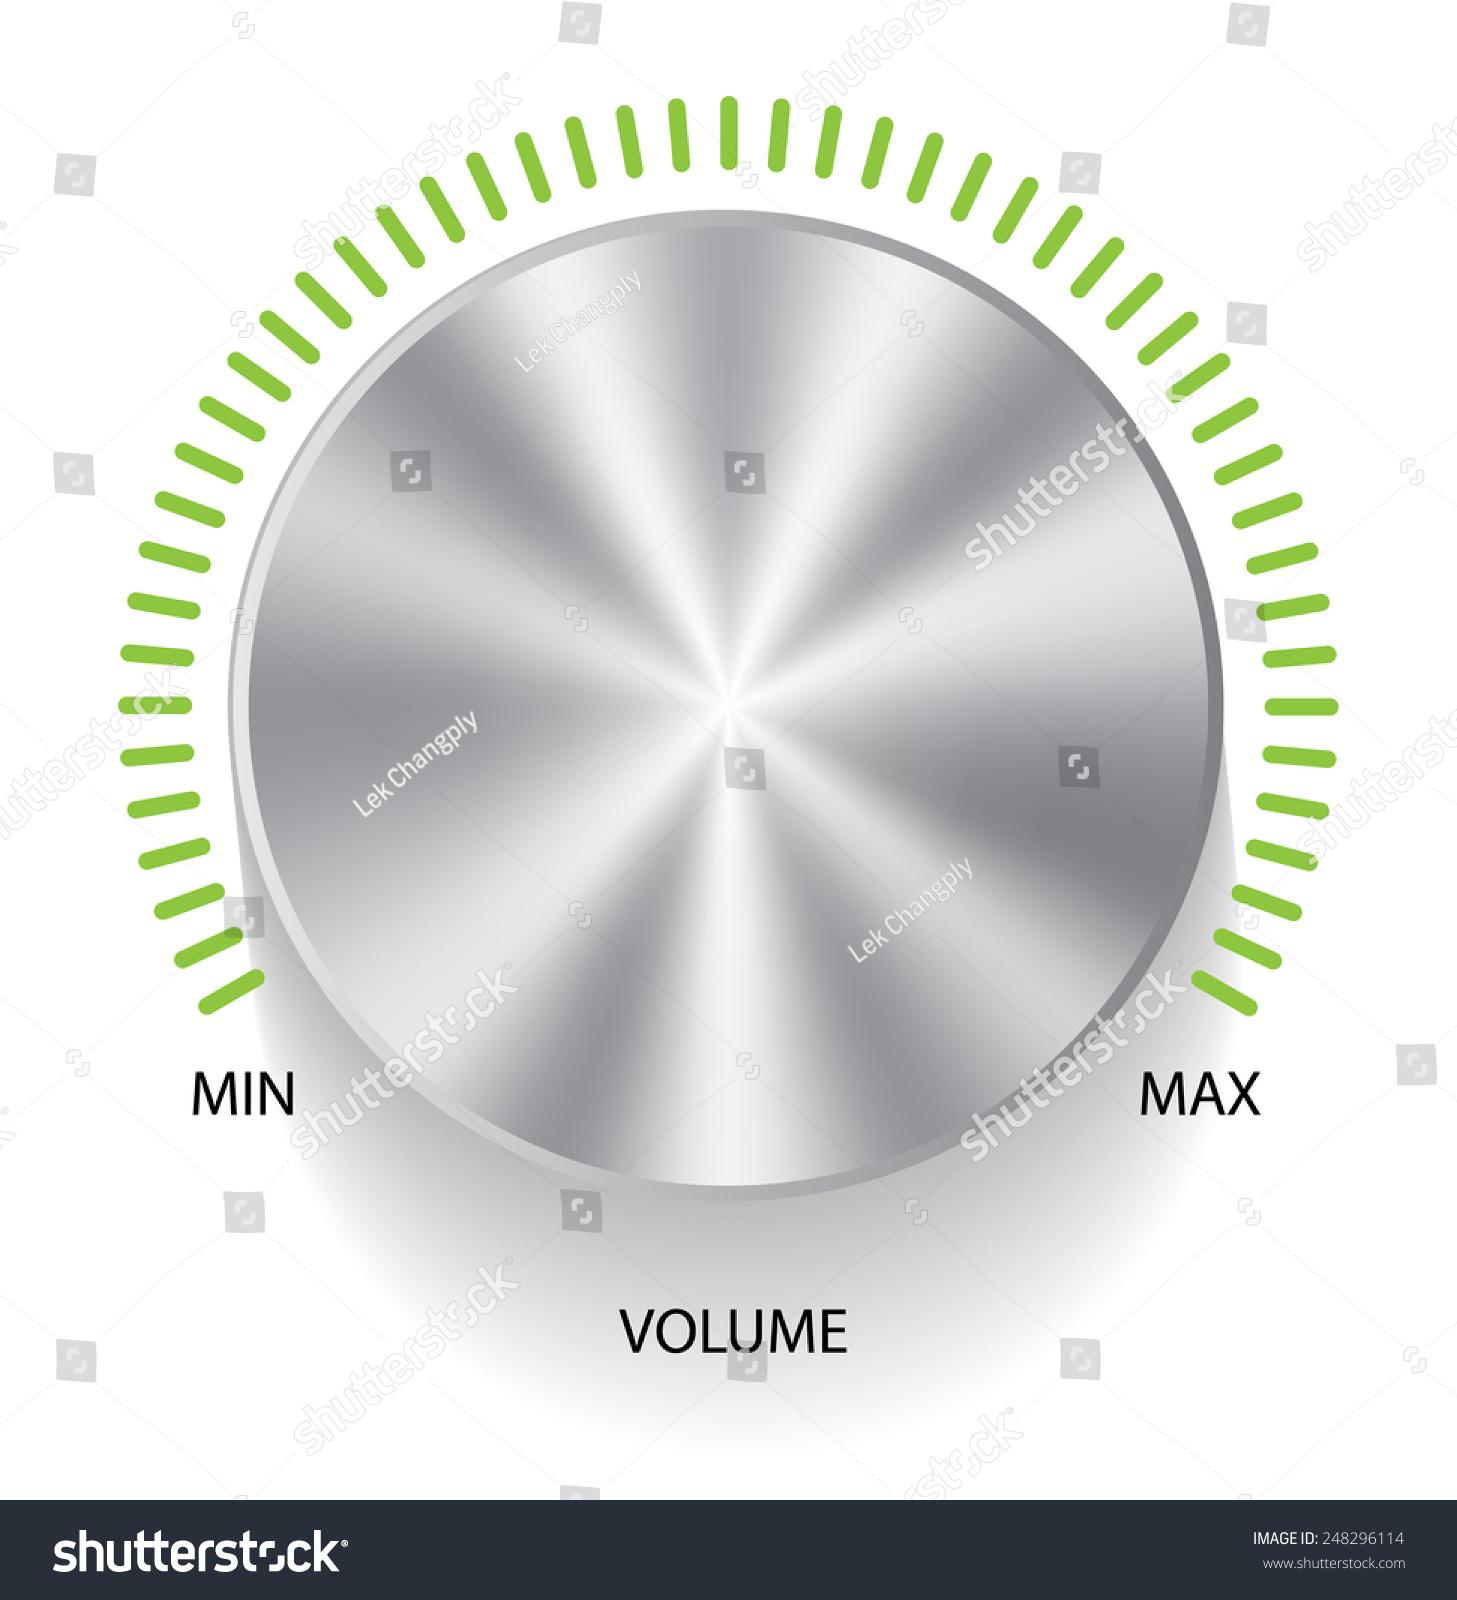 Volume Control Button : Metallic volume control button with scale vector